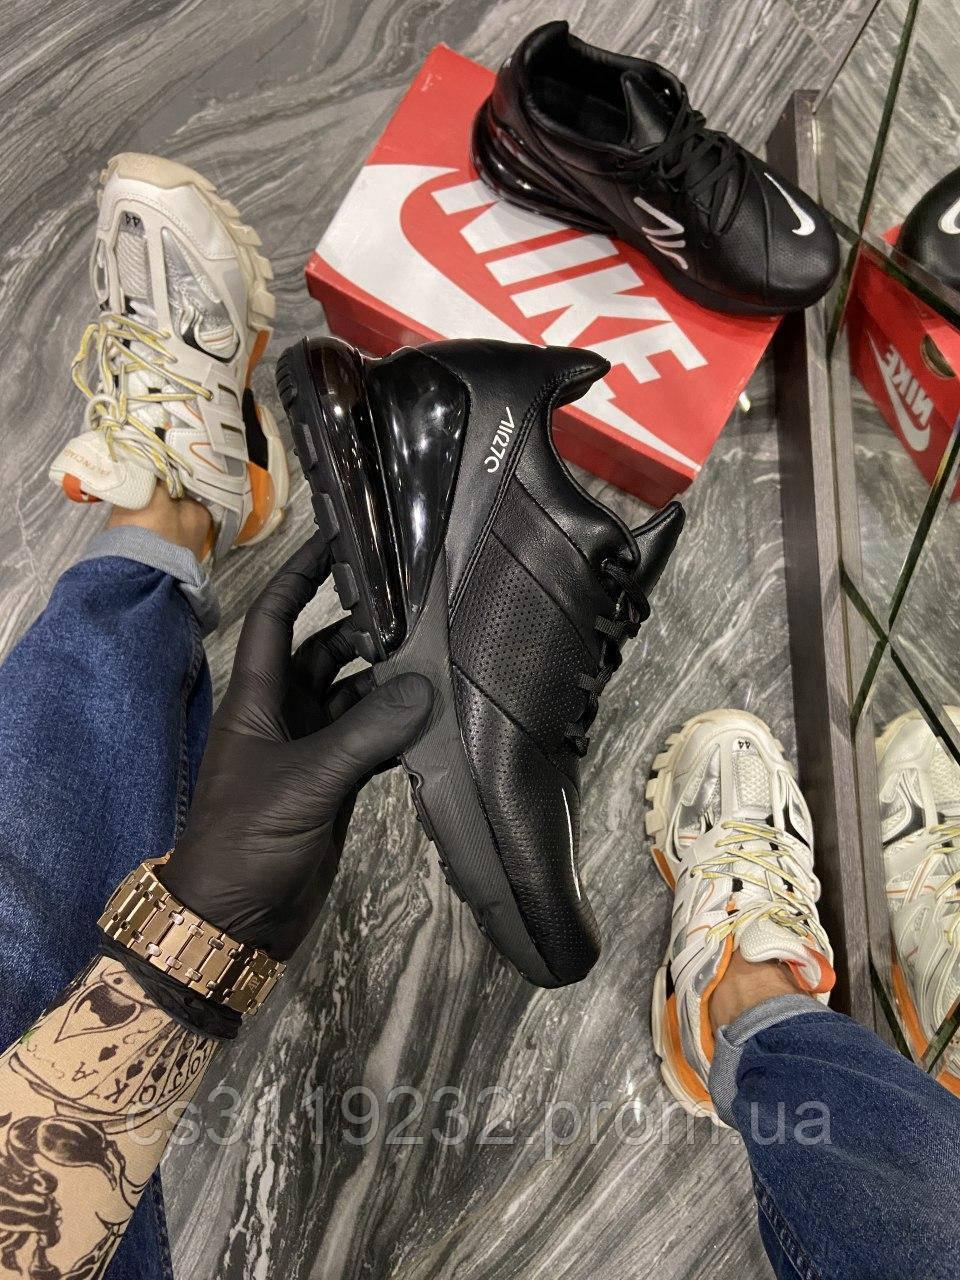 Мужские кроссовки Nike Air Max 270 Leather Triple Black (черные)